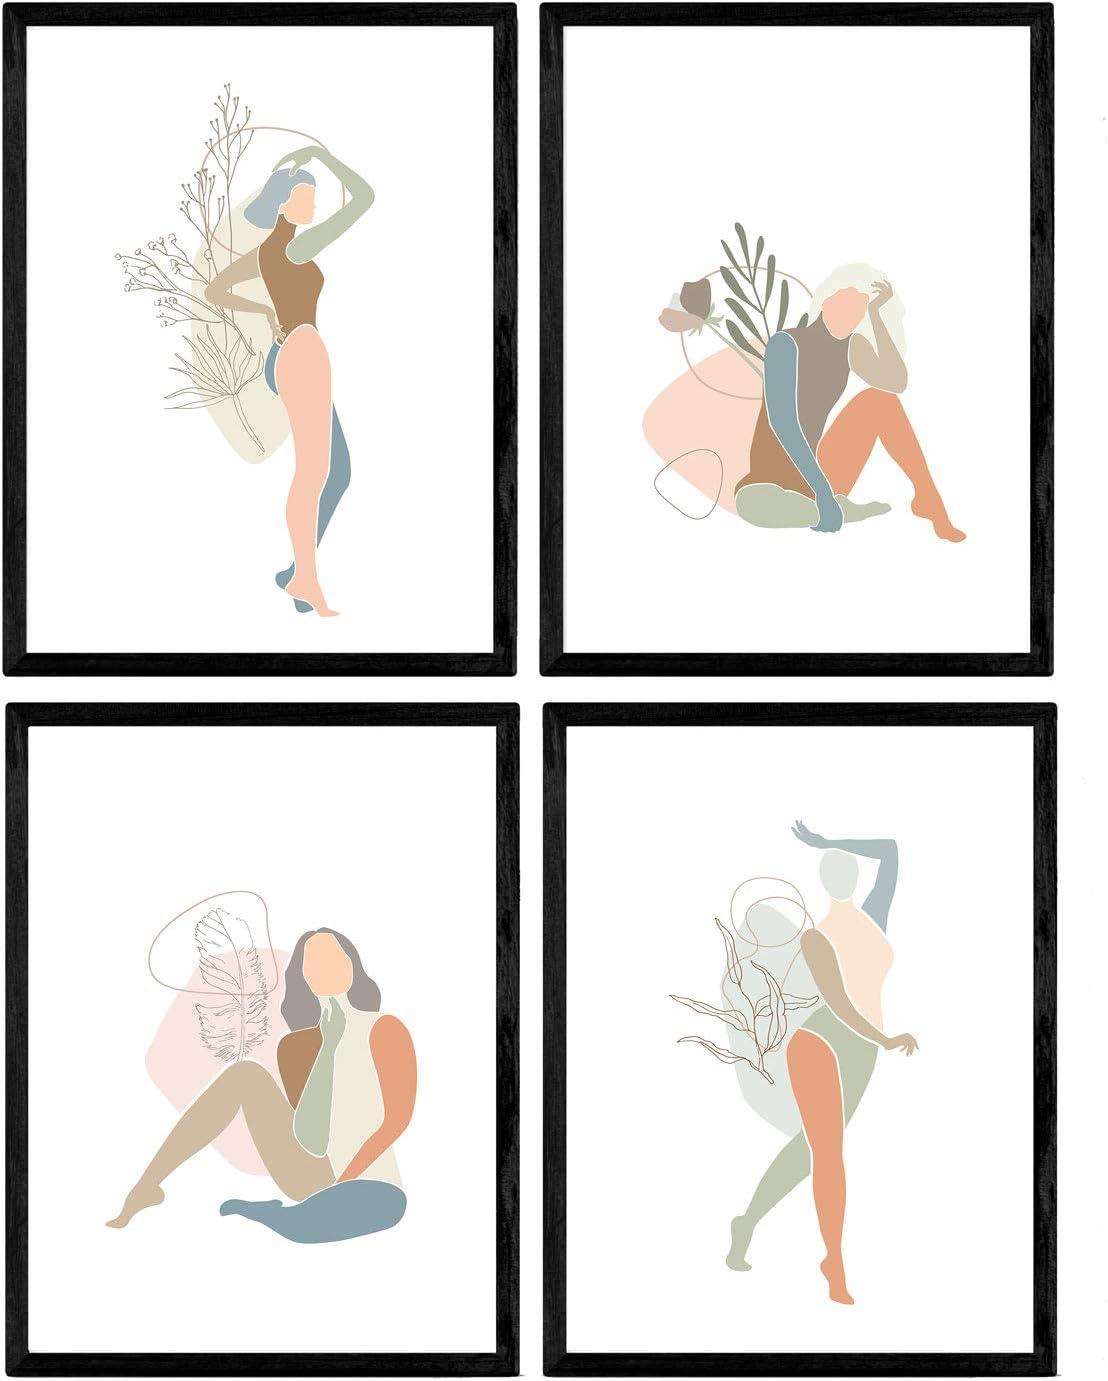 Nacnic Set of 1 - Unframed 8x11 inch Size - 250g Paper - Women Posing, Scandinvian Style, Free Spirited,Pink, Blue, Green Orange Gray, Olive Branch, Flower